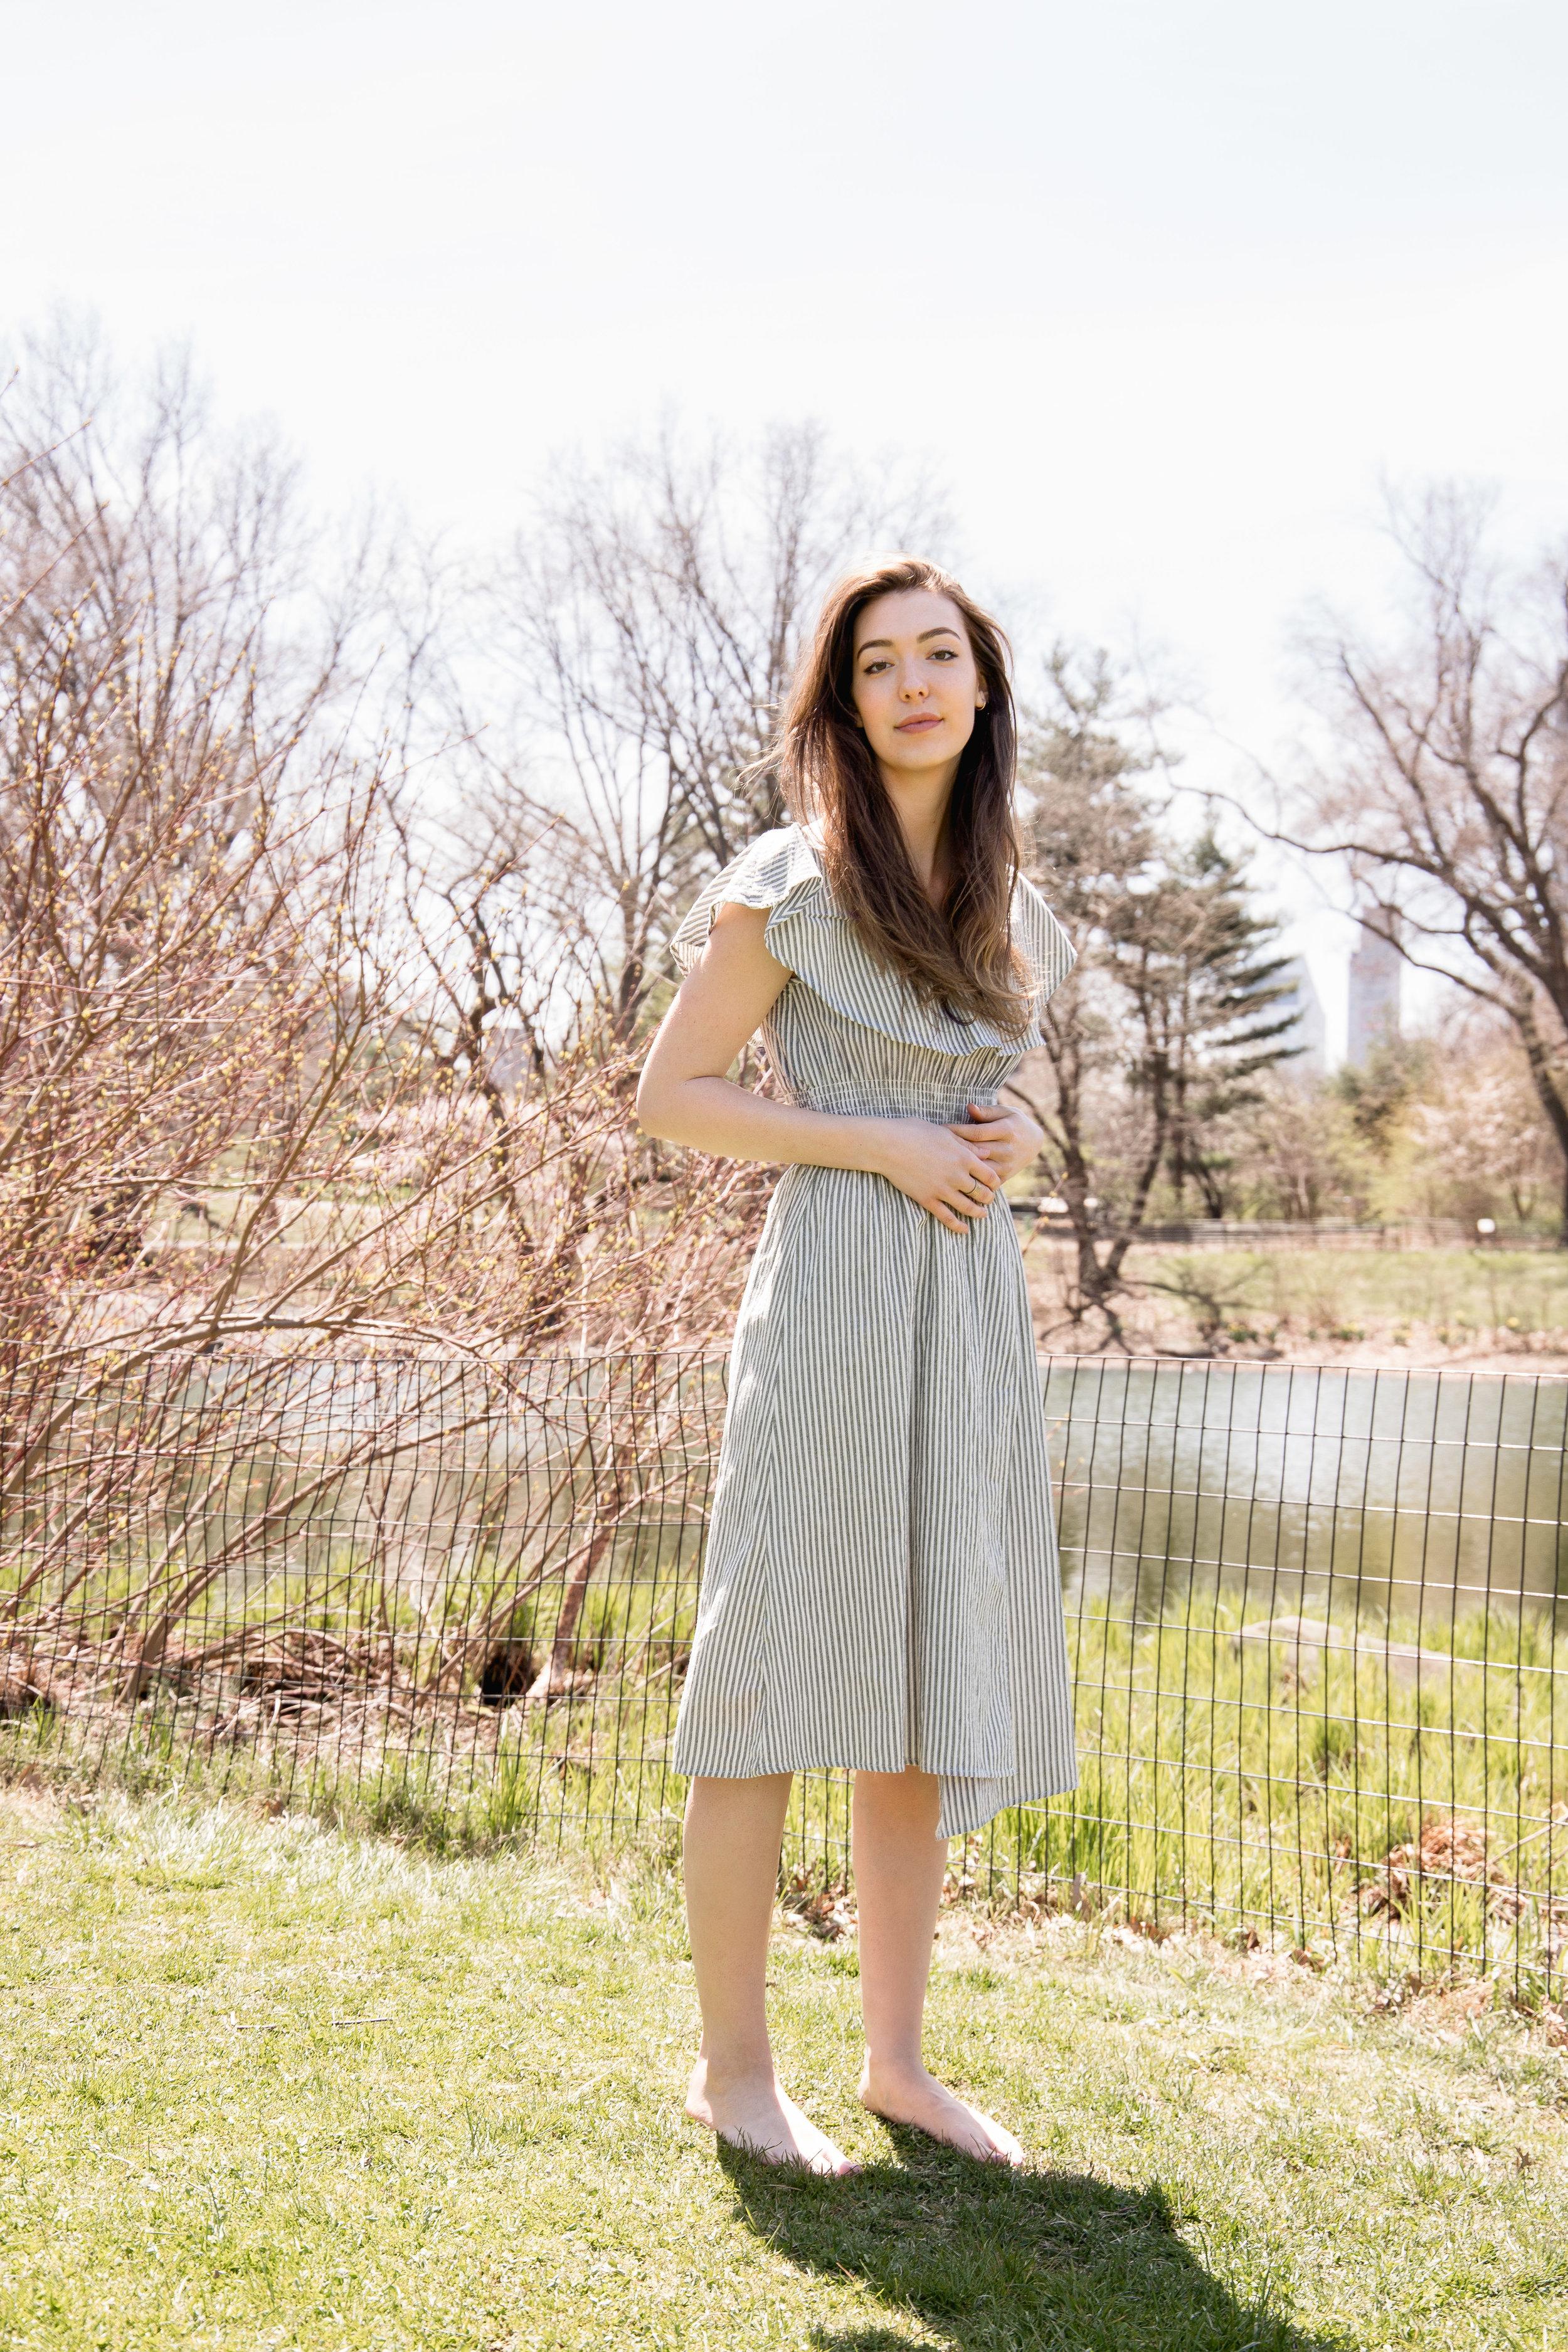 2018_04_21_Samantha_Swenson-1--12.jpg